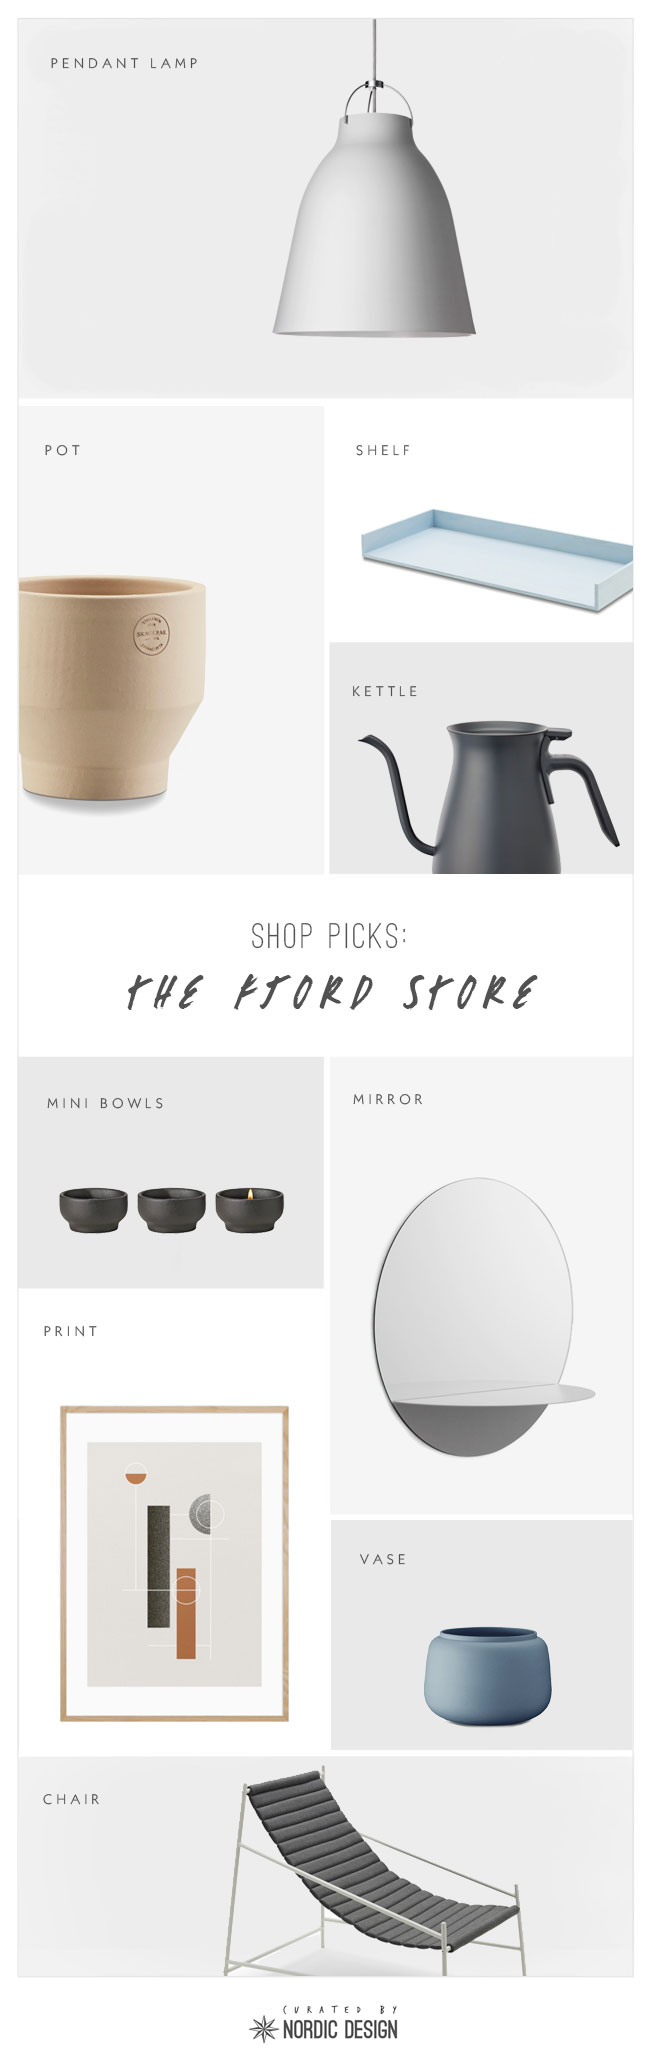 Shop-picks-THE-FJORD-STORE